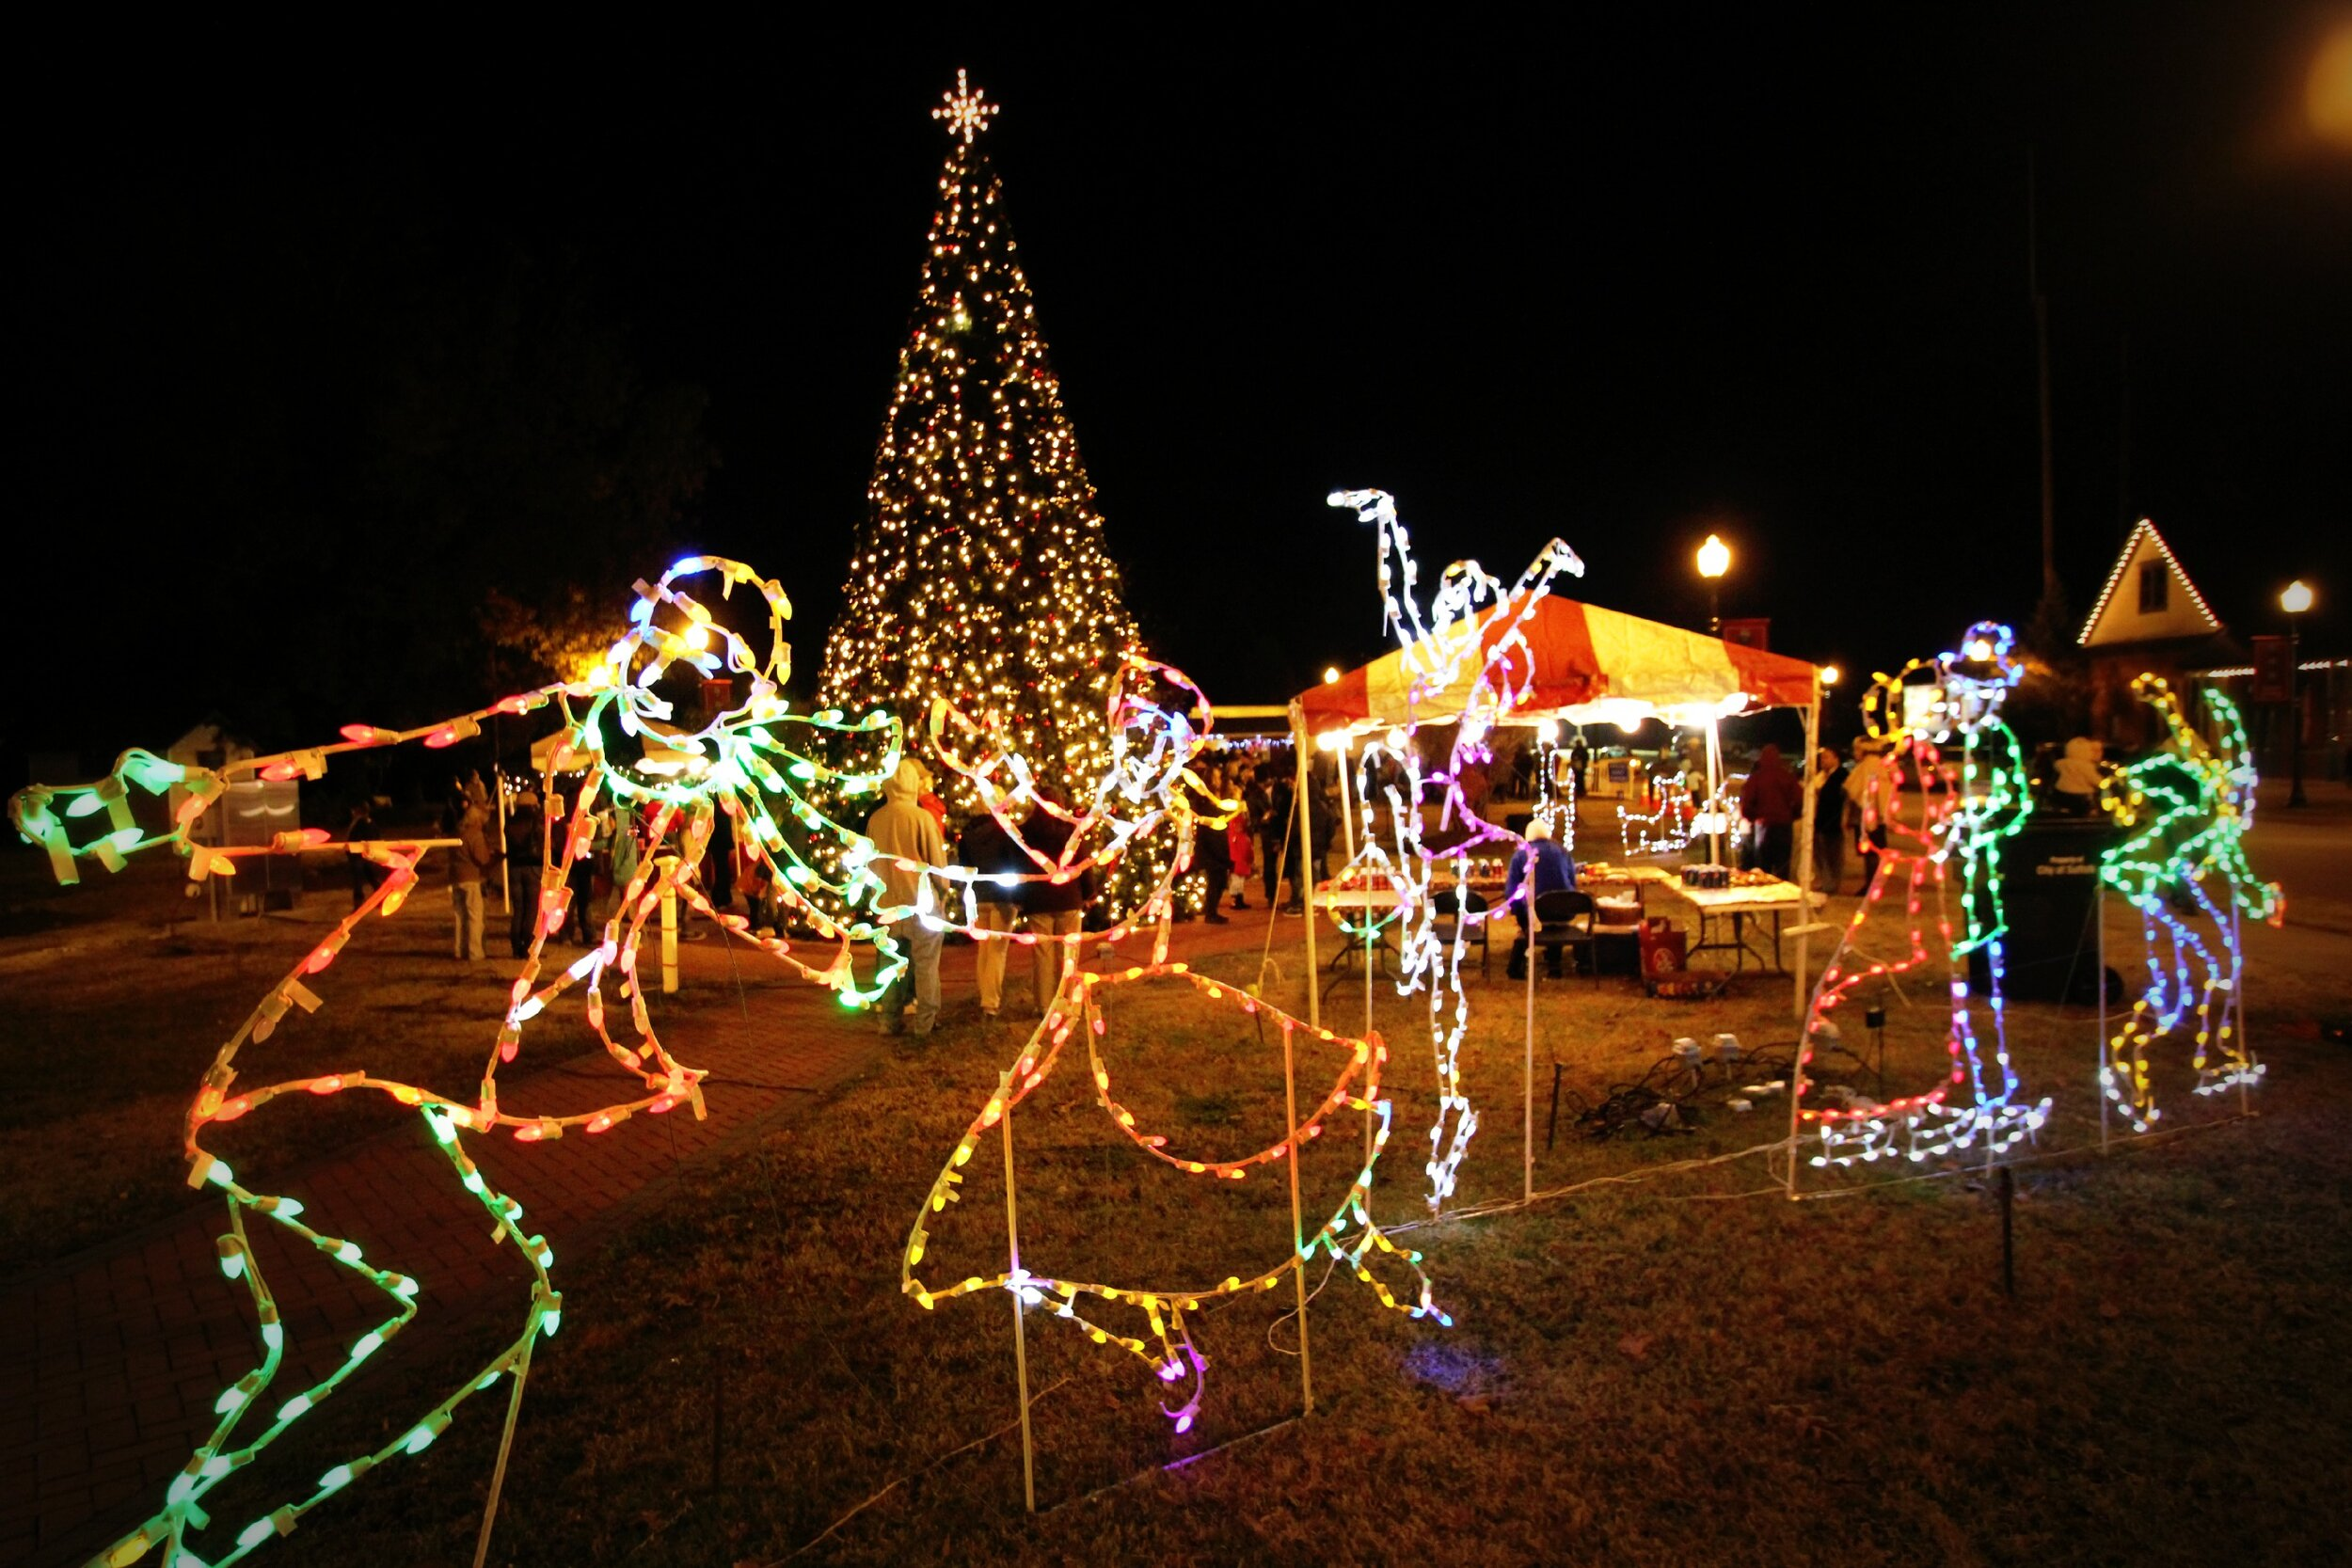 2011 Grand Illumination Edit 14.jpg